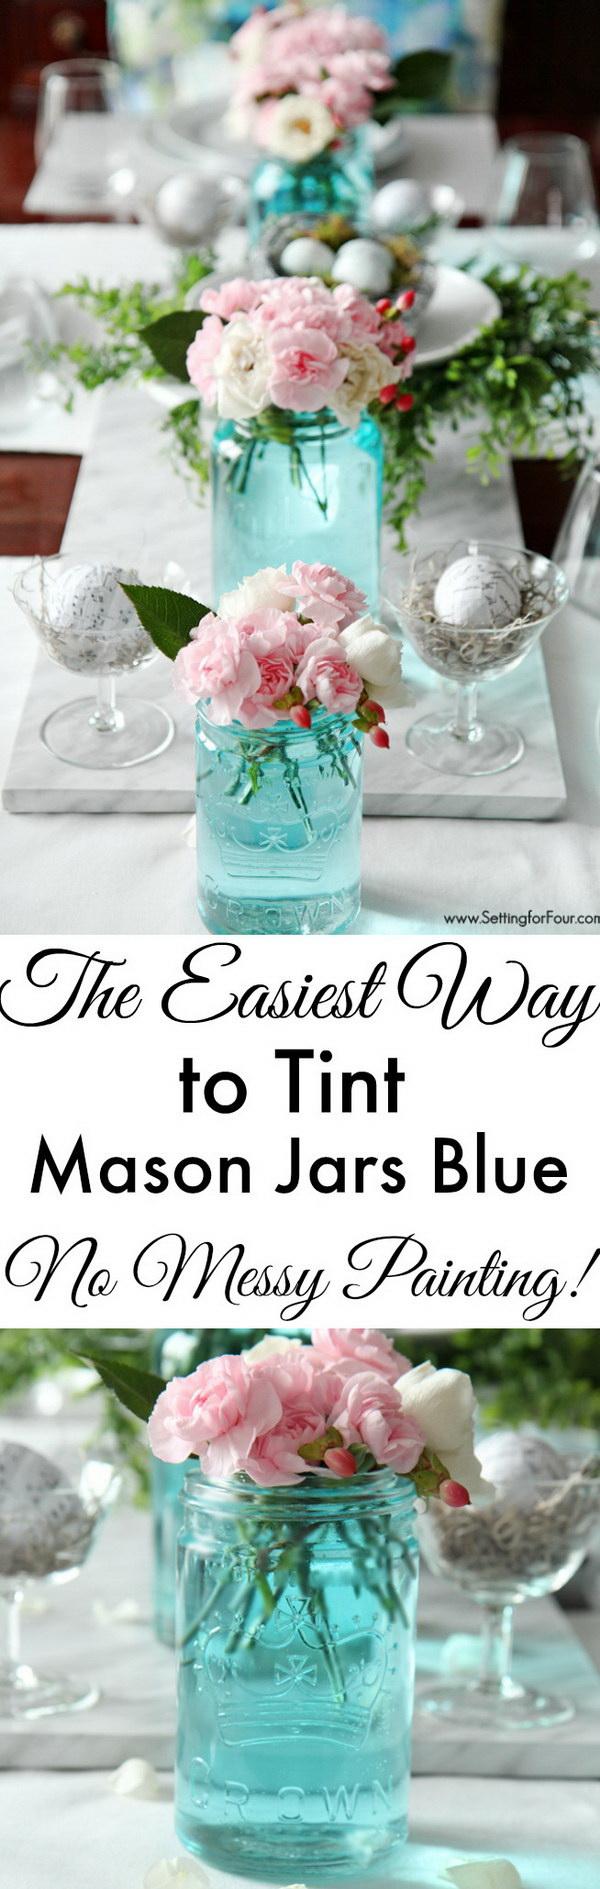 Beautiful Tint Mason Jars Blue for Wedding Decor.